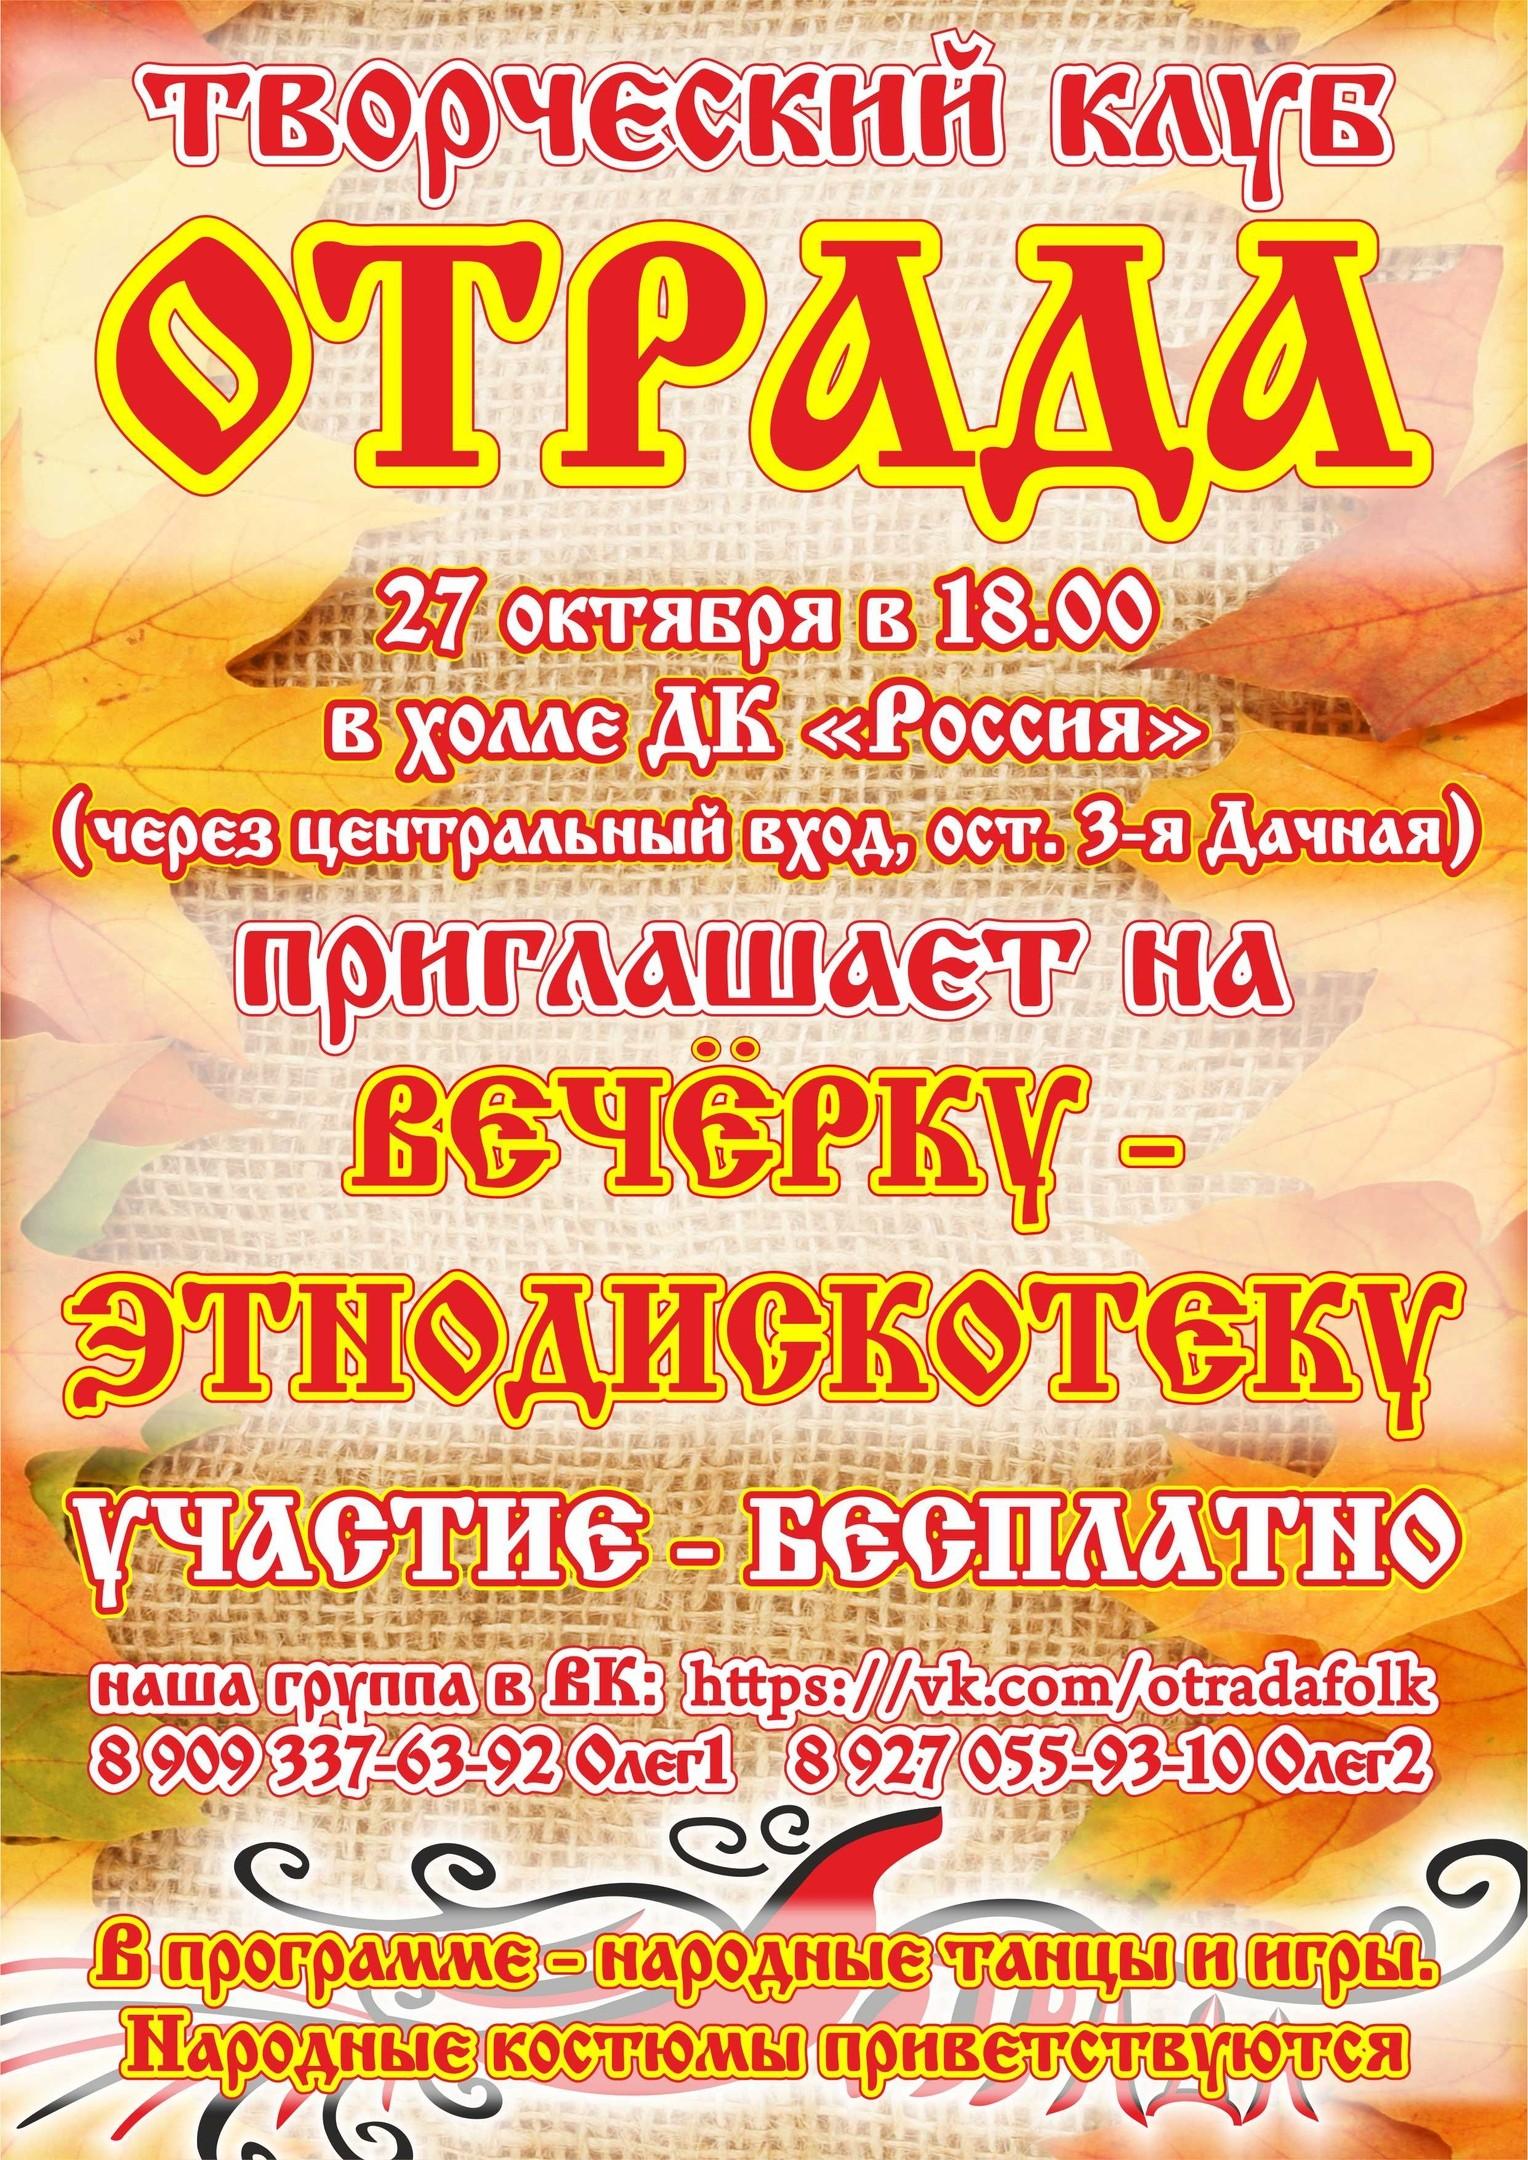 Вечерка-этнодискотека от творческого клуба «Отрада»